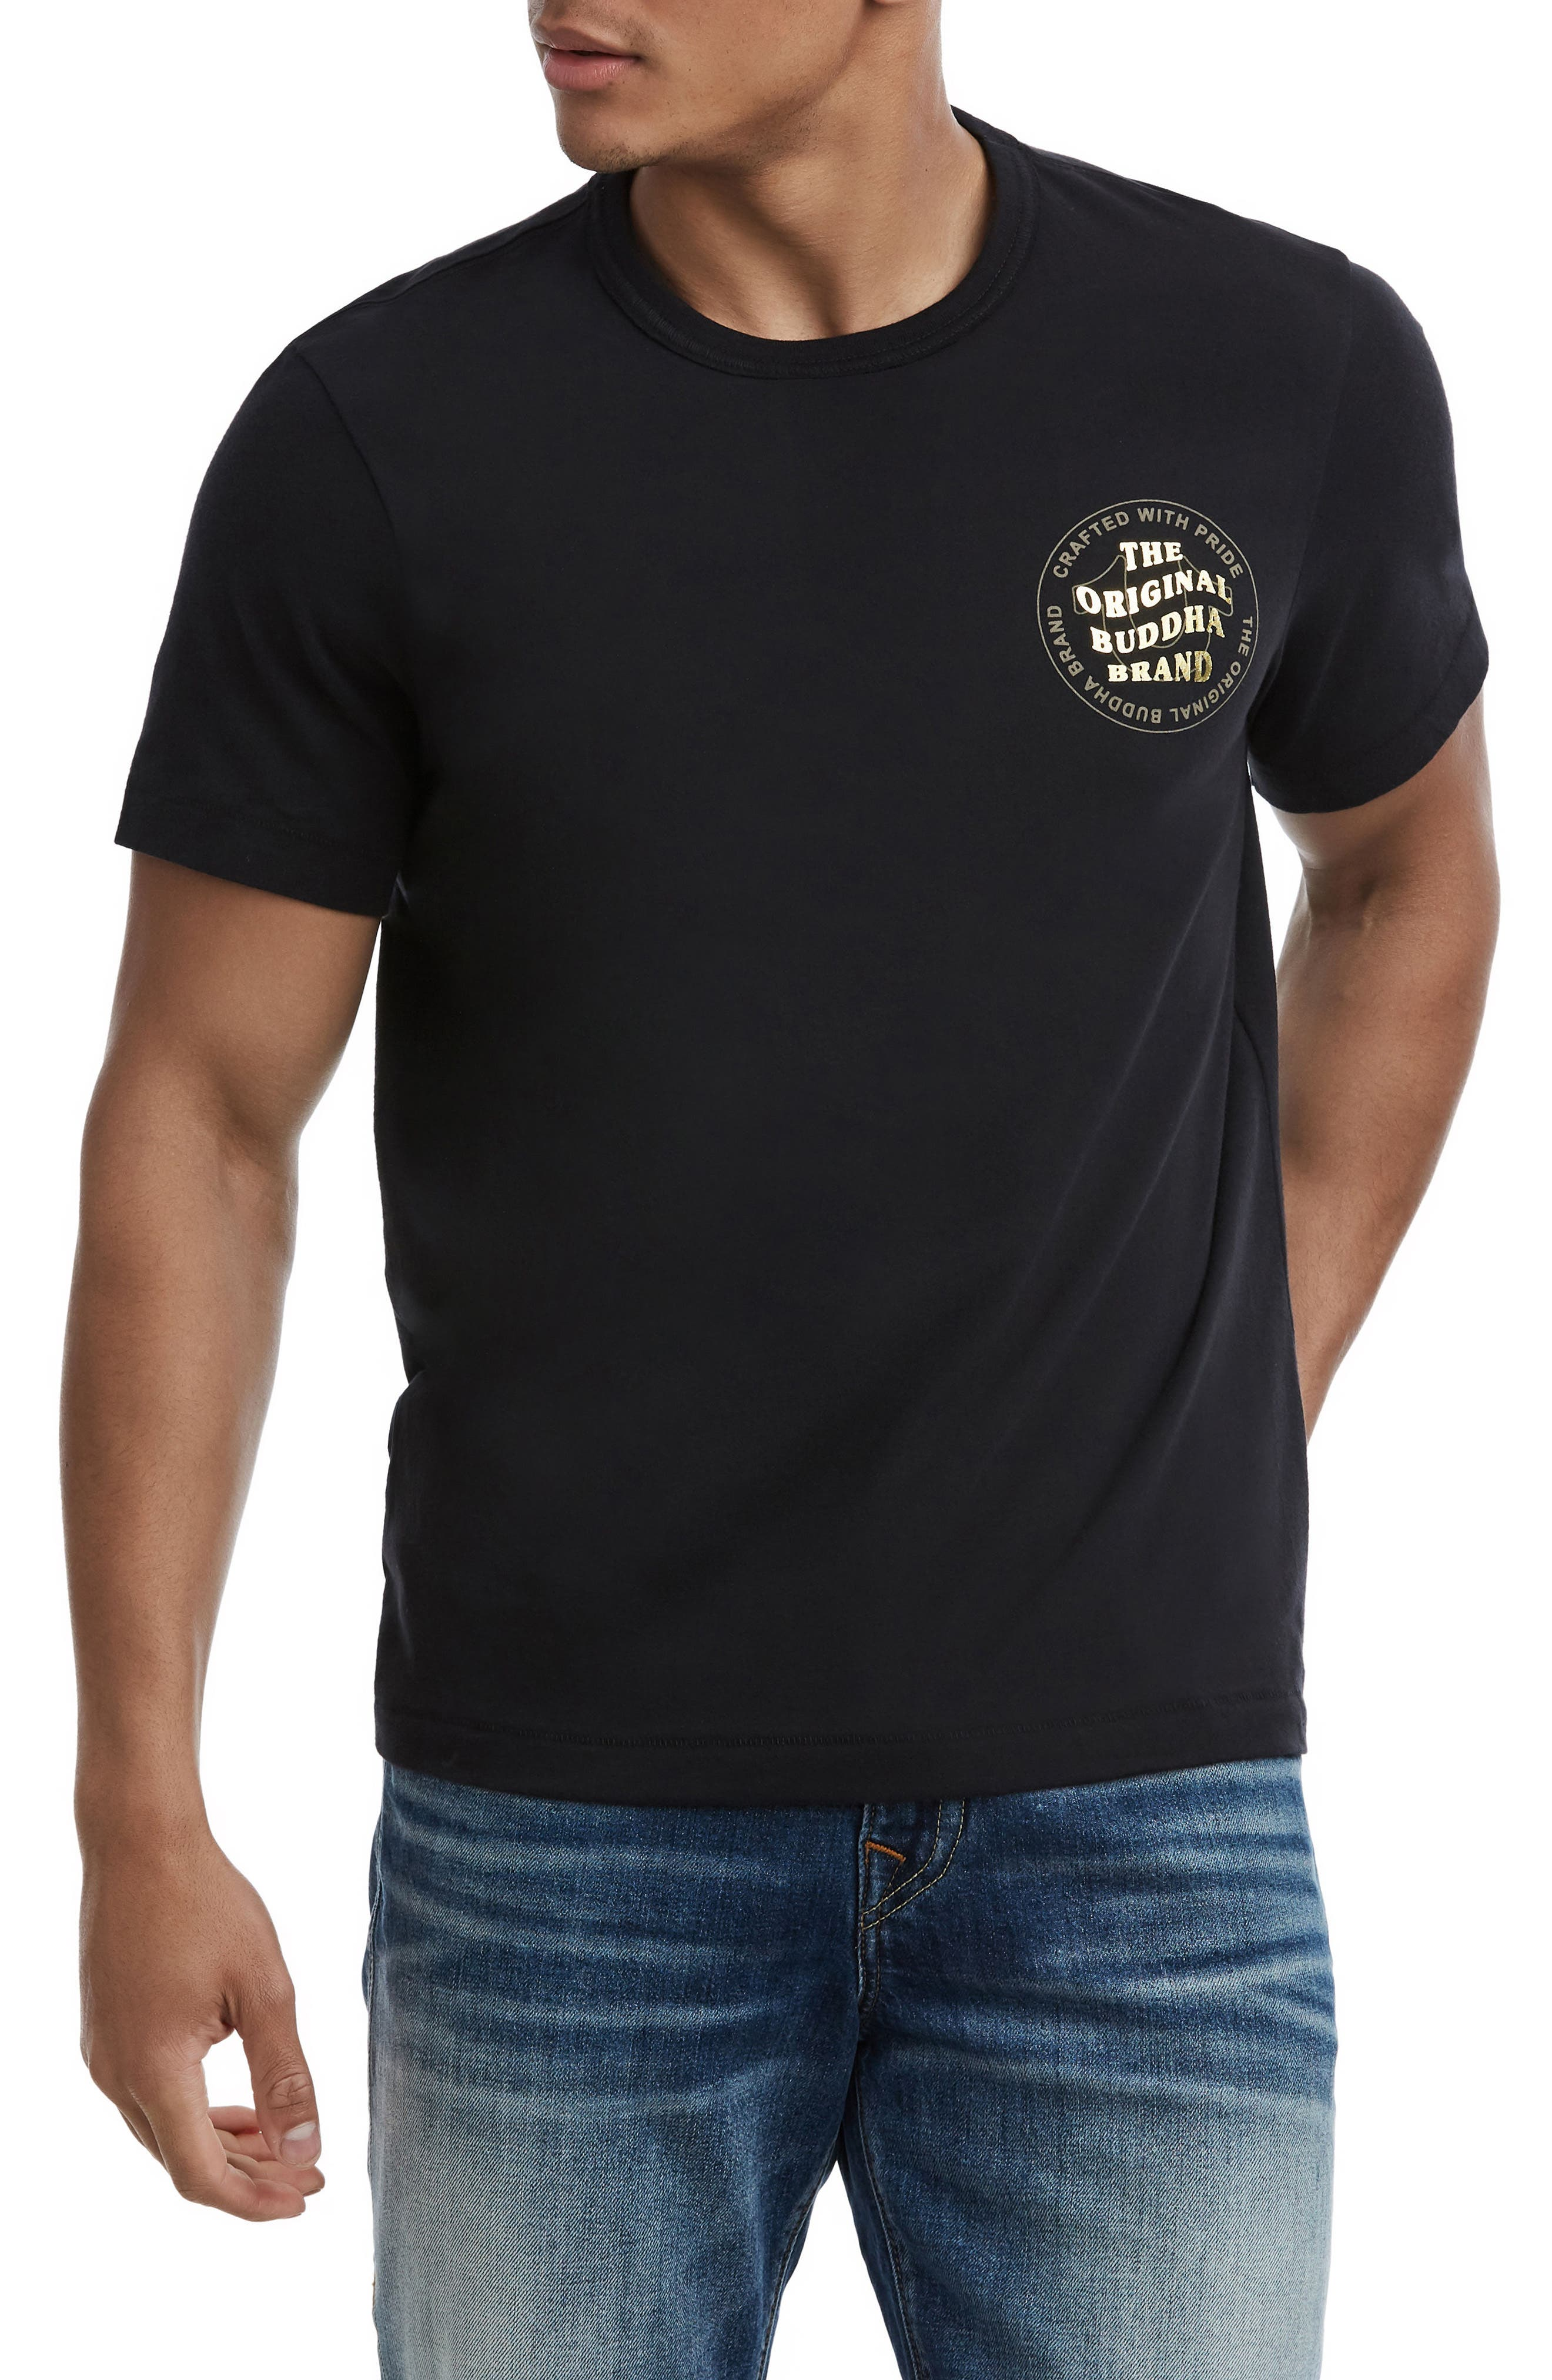 Wavy Buddha Brand T-Shirt,                             Main thumbnail 1, color,                             001